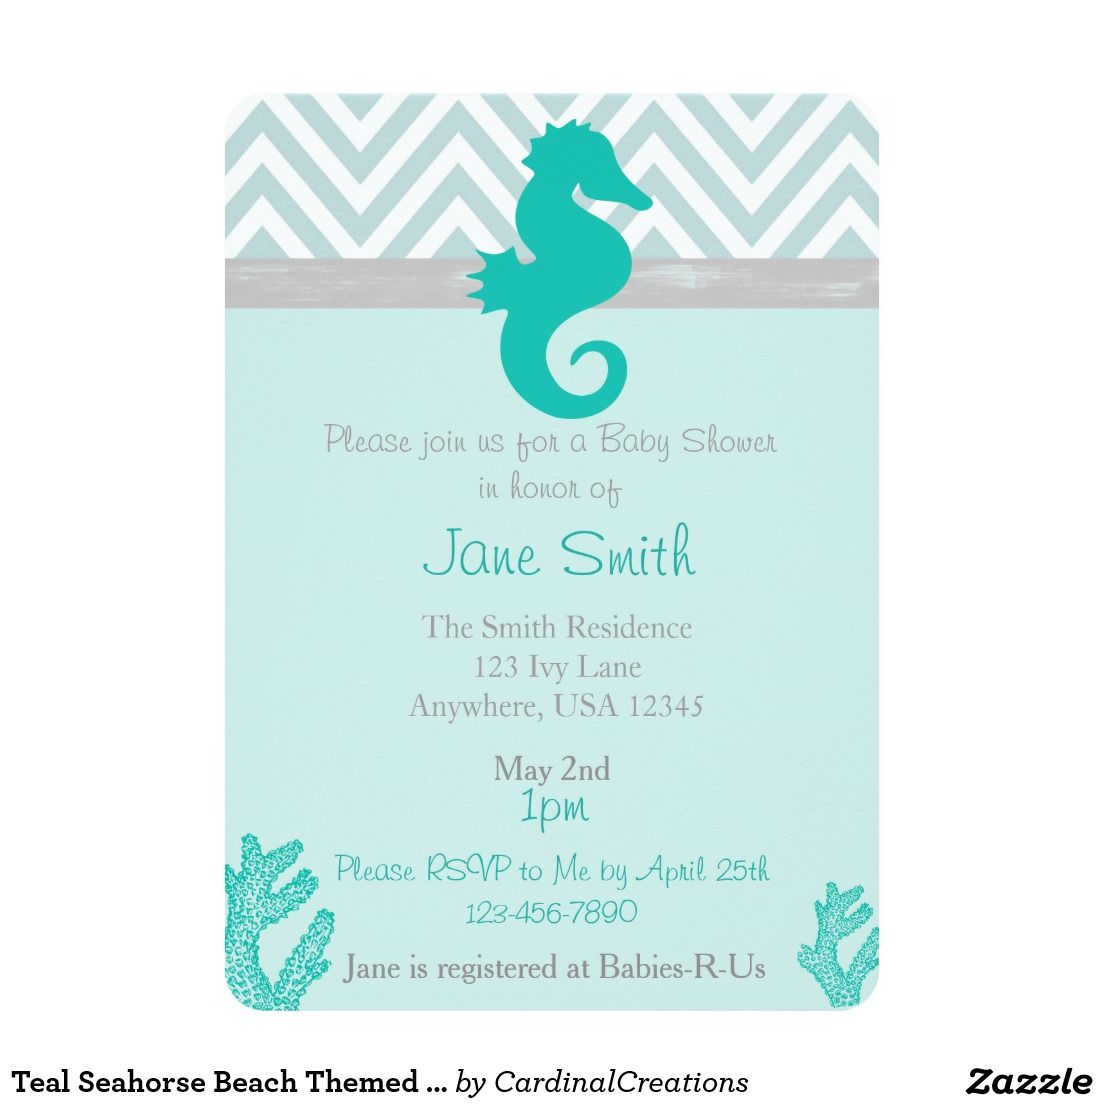 Teal Seahorse Beach Themed Baby Shower Invitation   Seahorses ...